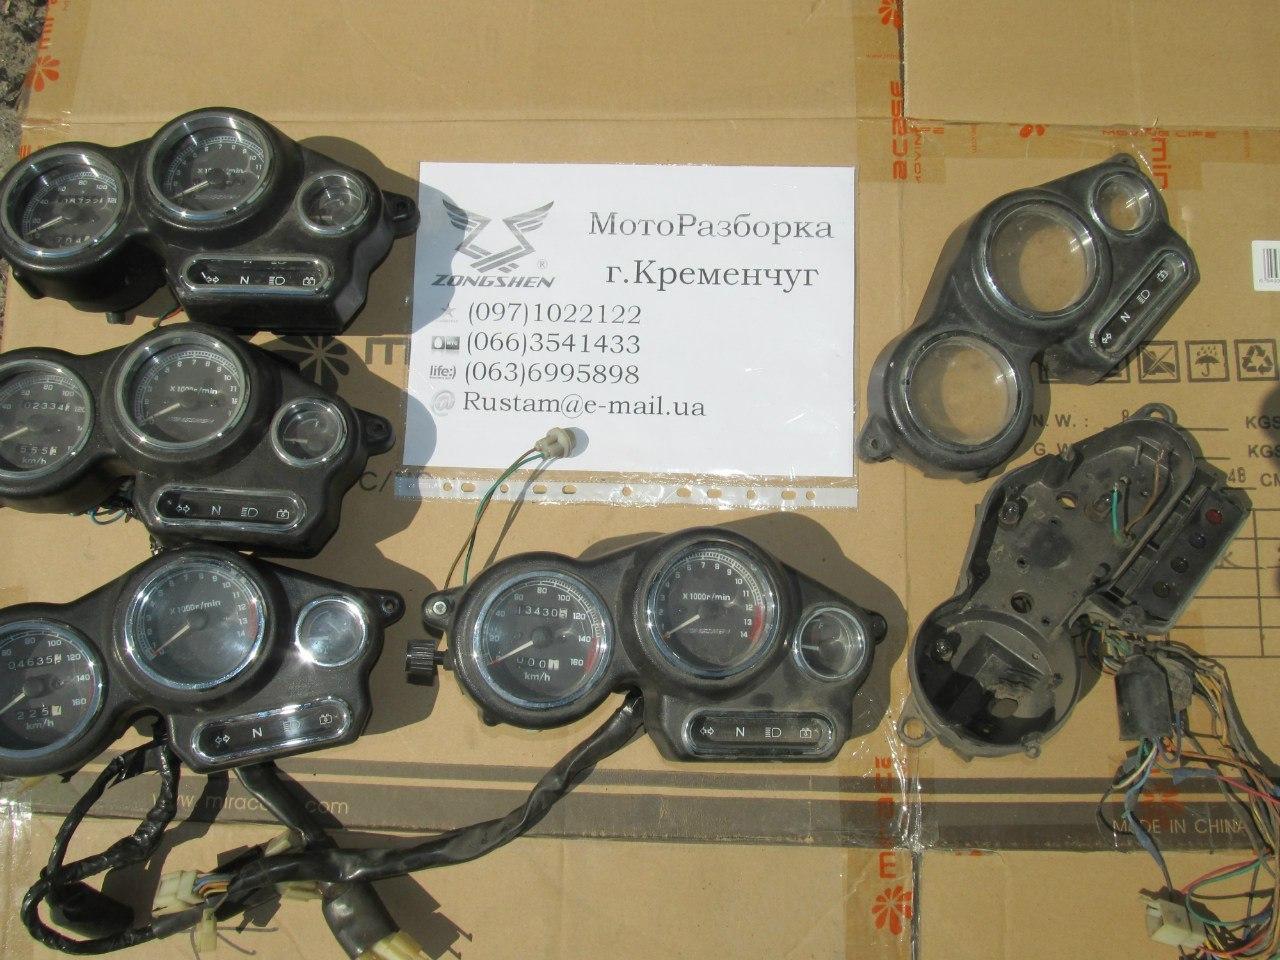 МотоРазборка г.Кременчуг Zongshen 200-250, Suzuki bandit 400-1, Venom 200 1PTfIuef_cA